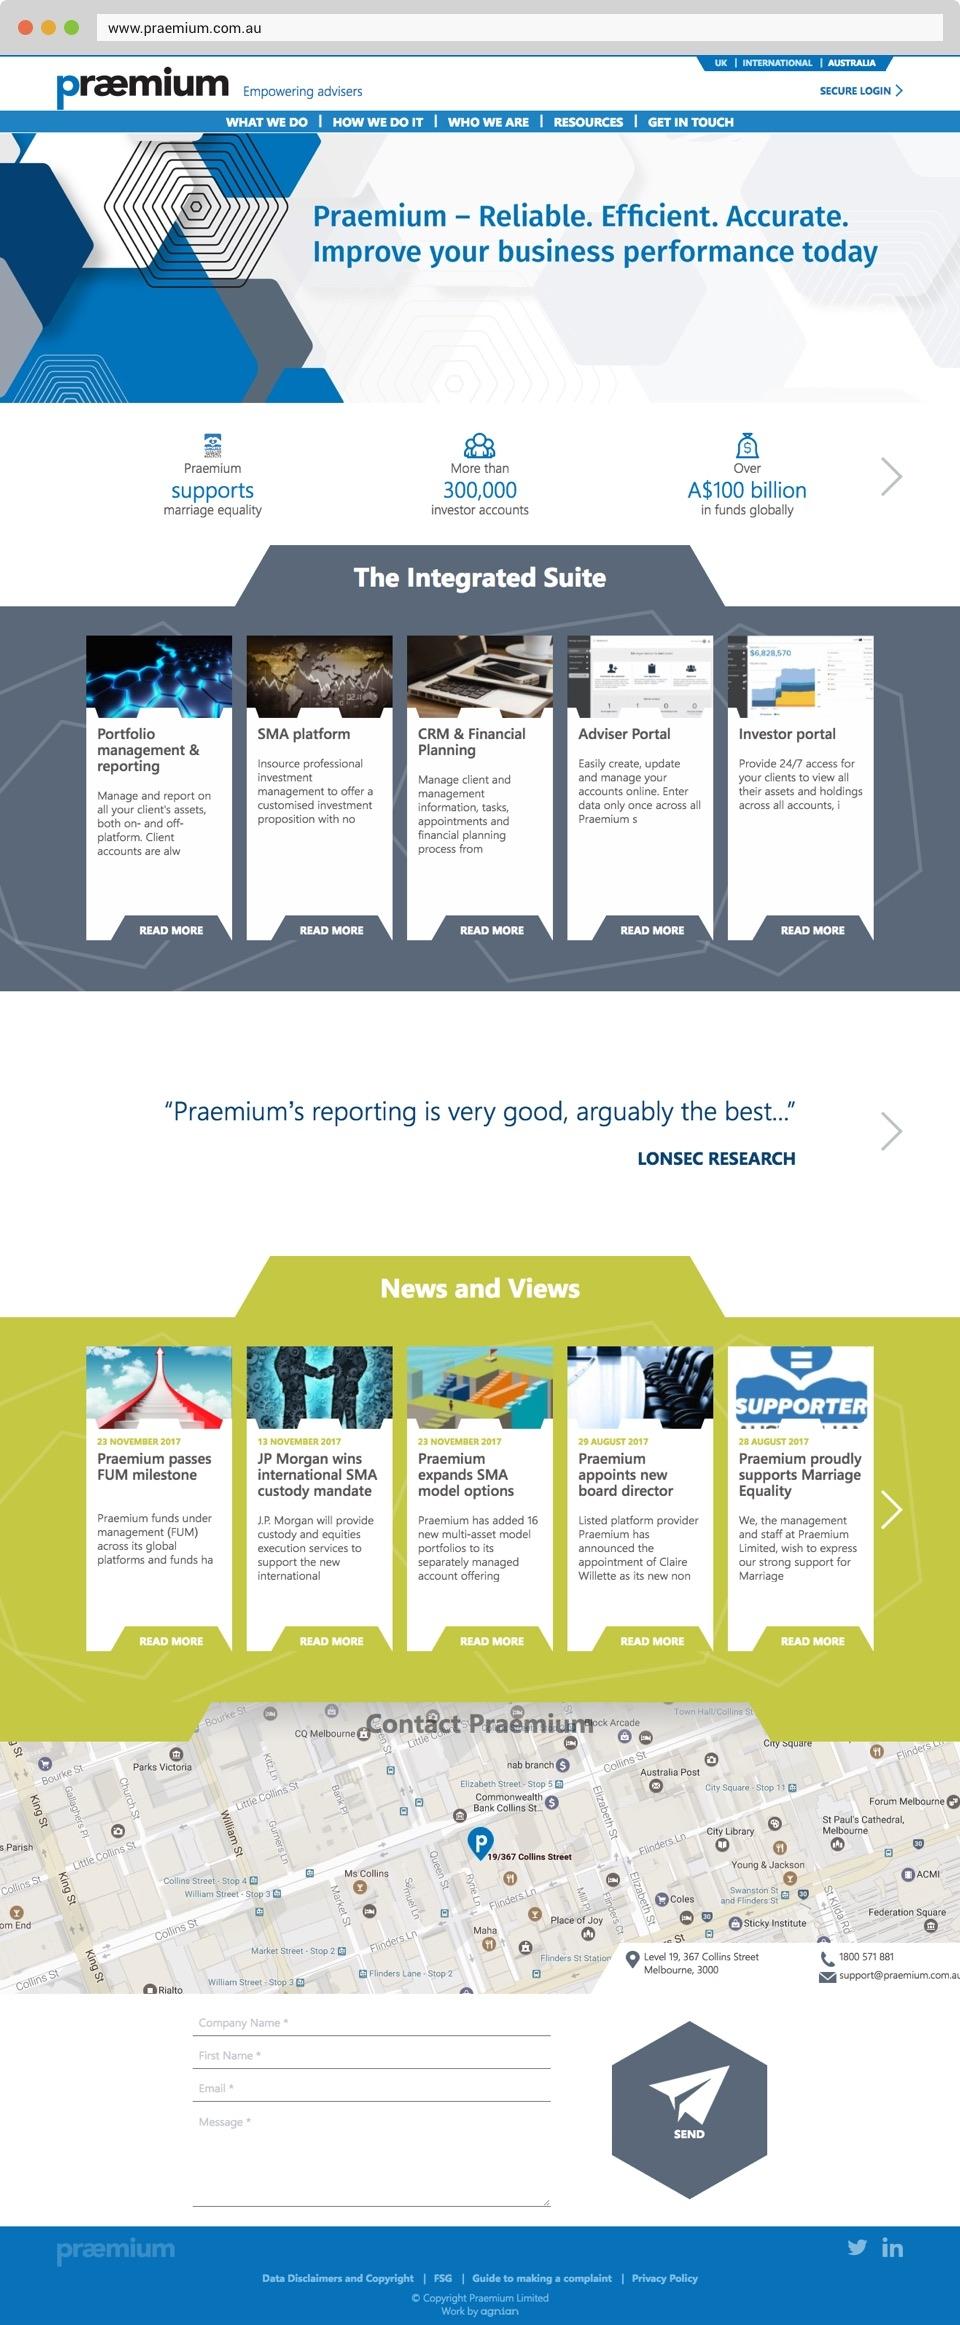 Praemium - Website Front Page Screen